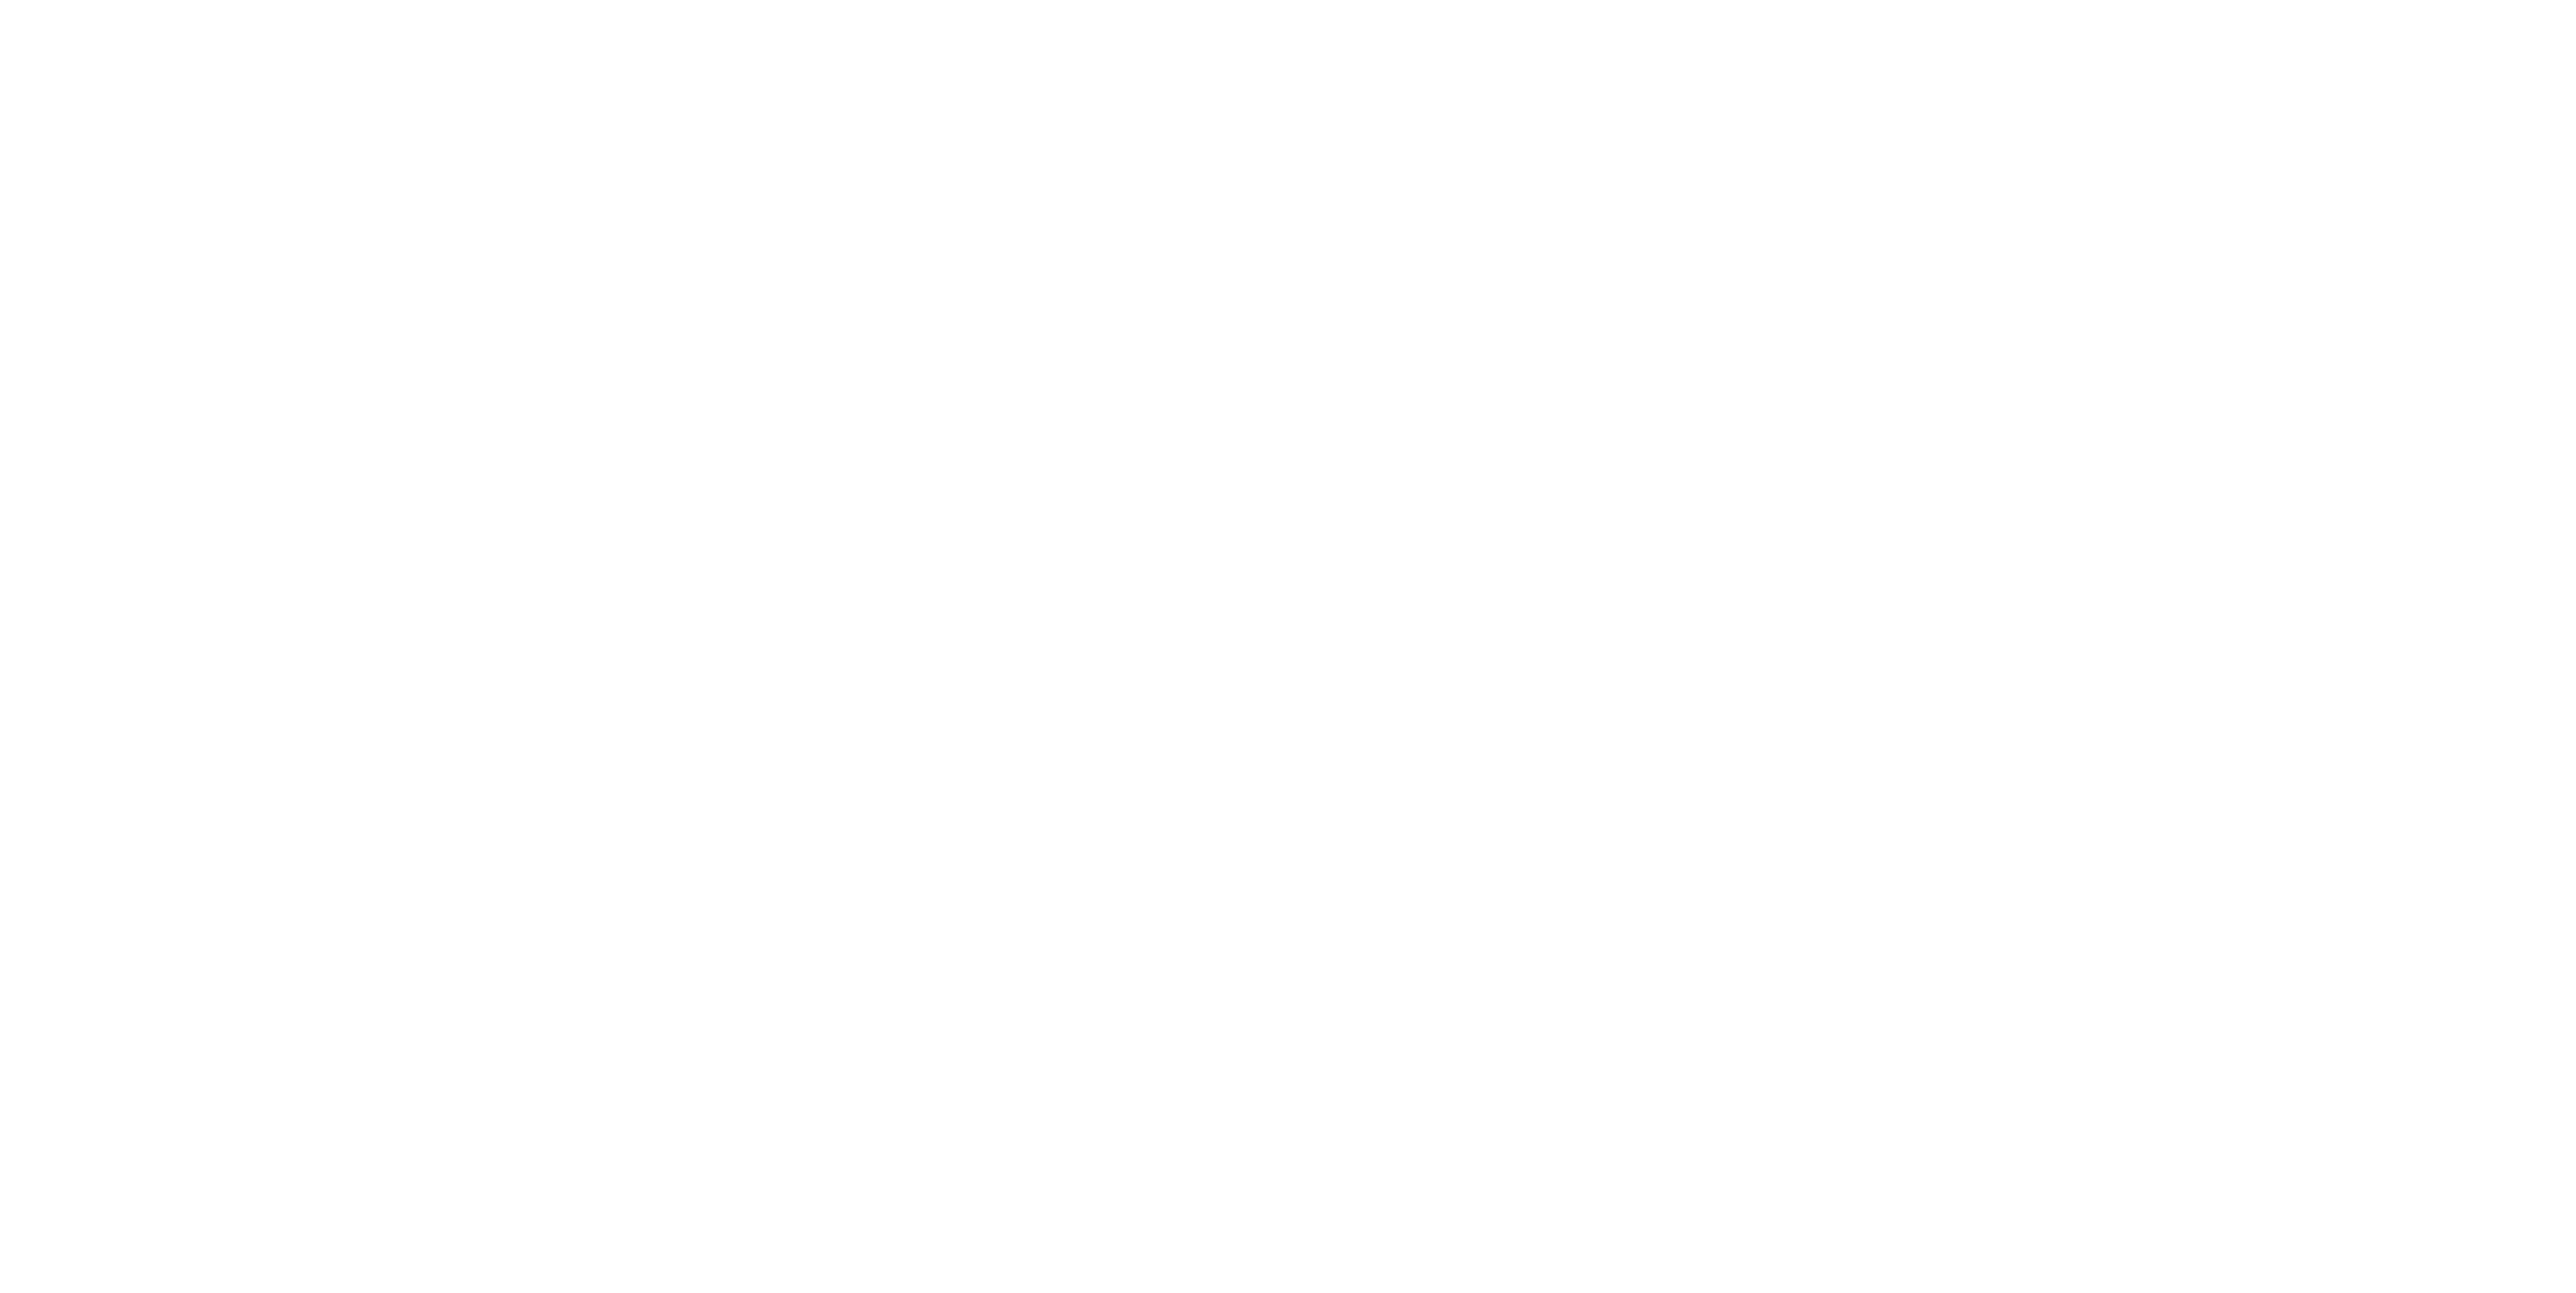 ENRIQUE MAZZOLA CONDUCTS BRAHMS 4, VERDI & ROTA